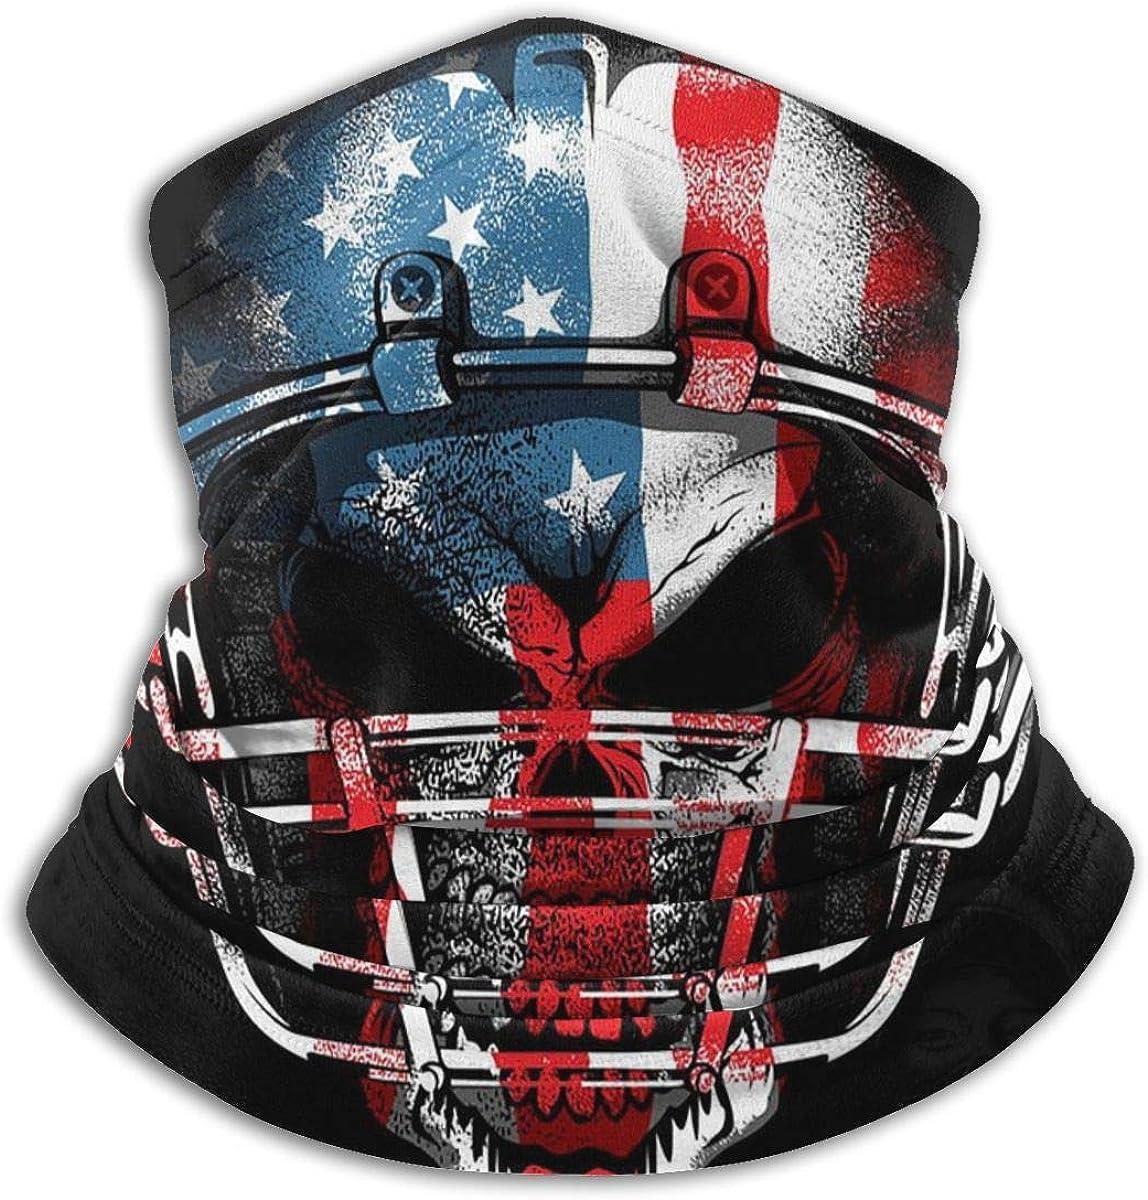 CLERO& Scarf Fleece Neck Warmer Football Helmet Skull American Flag Windproof Outdoor Headwear Comfortable Neck Gaiter Warmer Face Mask for Cold Weather Winter Outdoor Sports